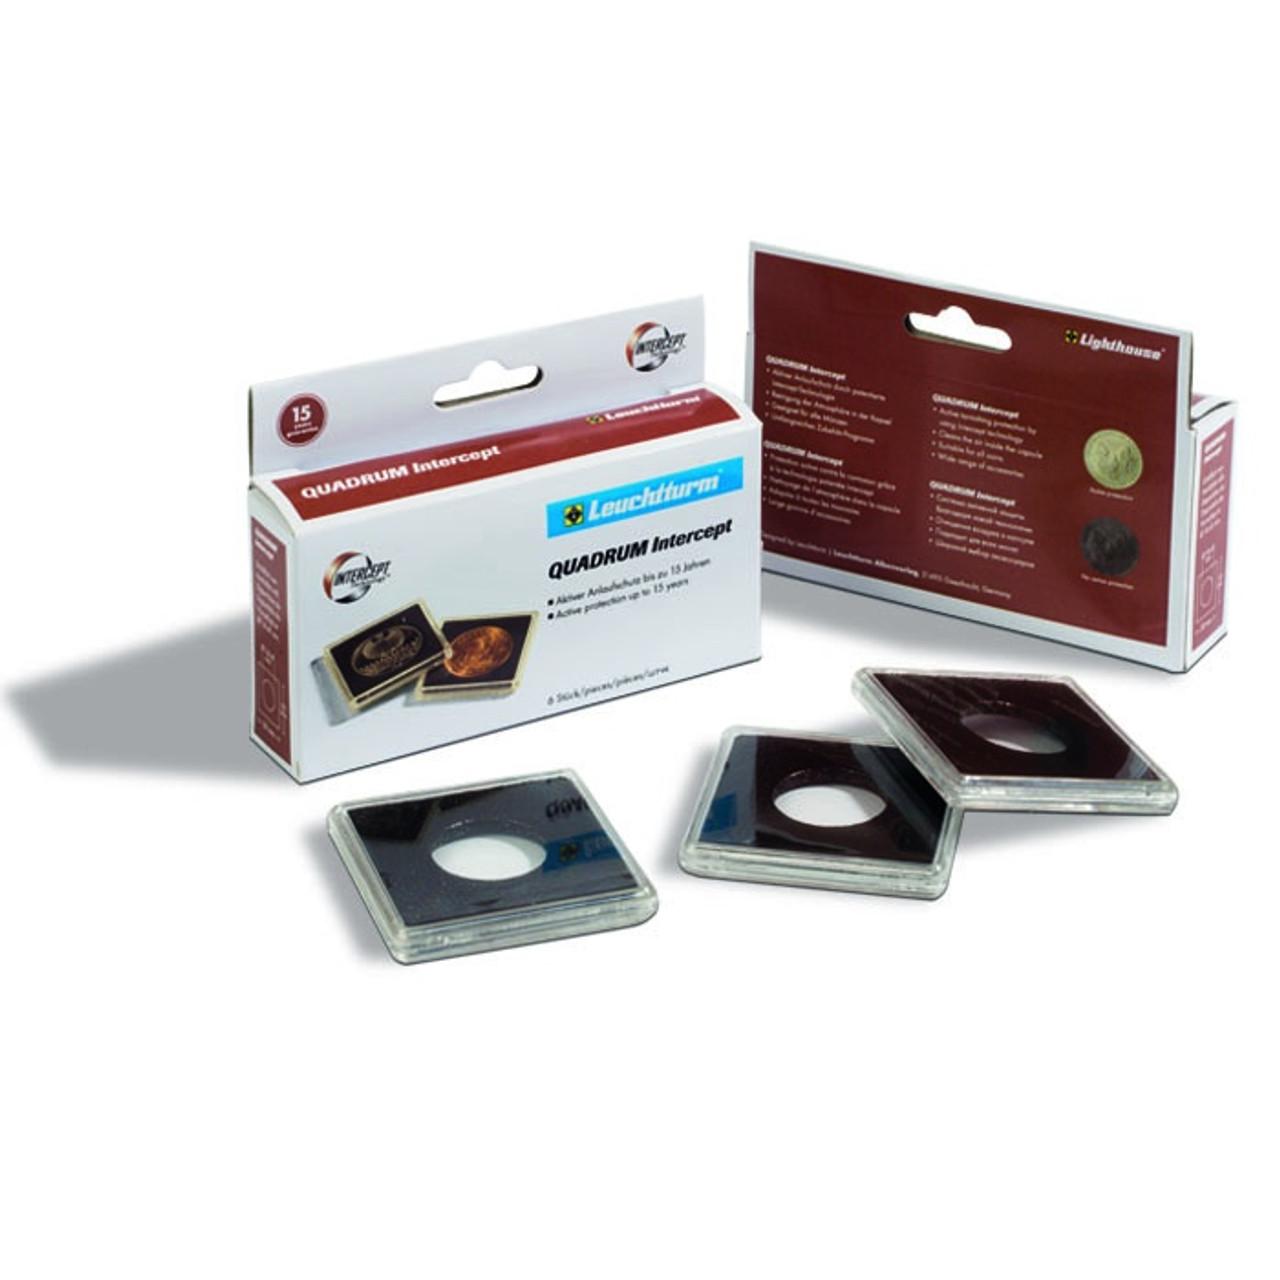 2x2 Quadrum 21mm Snaplock Coin Capsule Holder for US Nickels 10 Pack